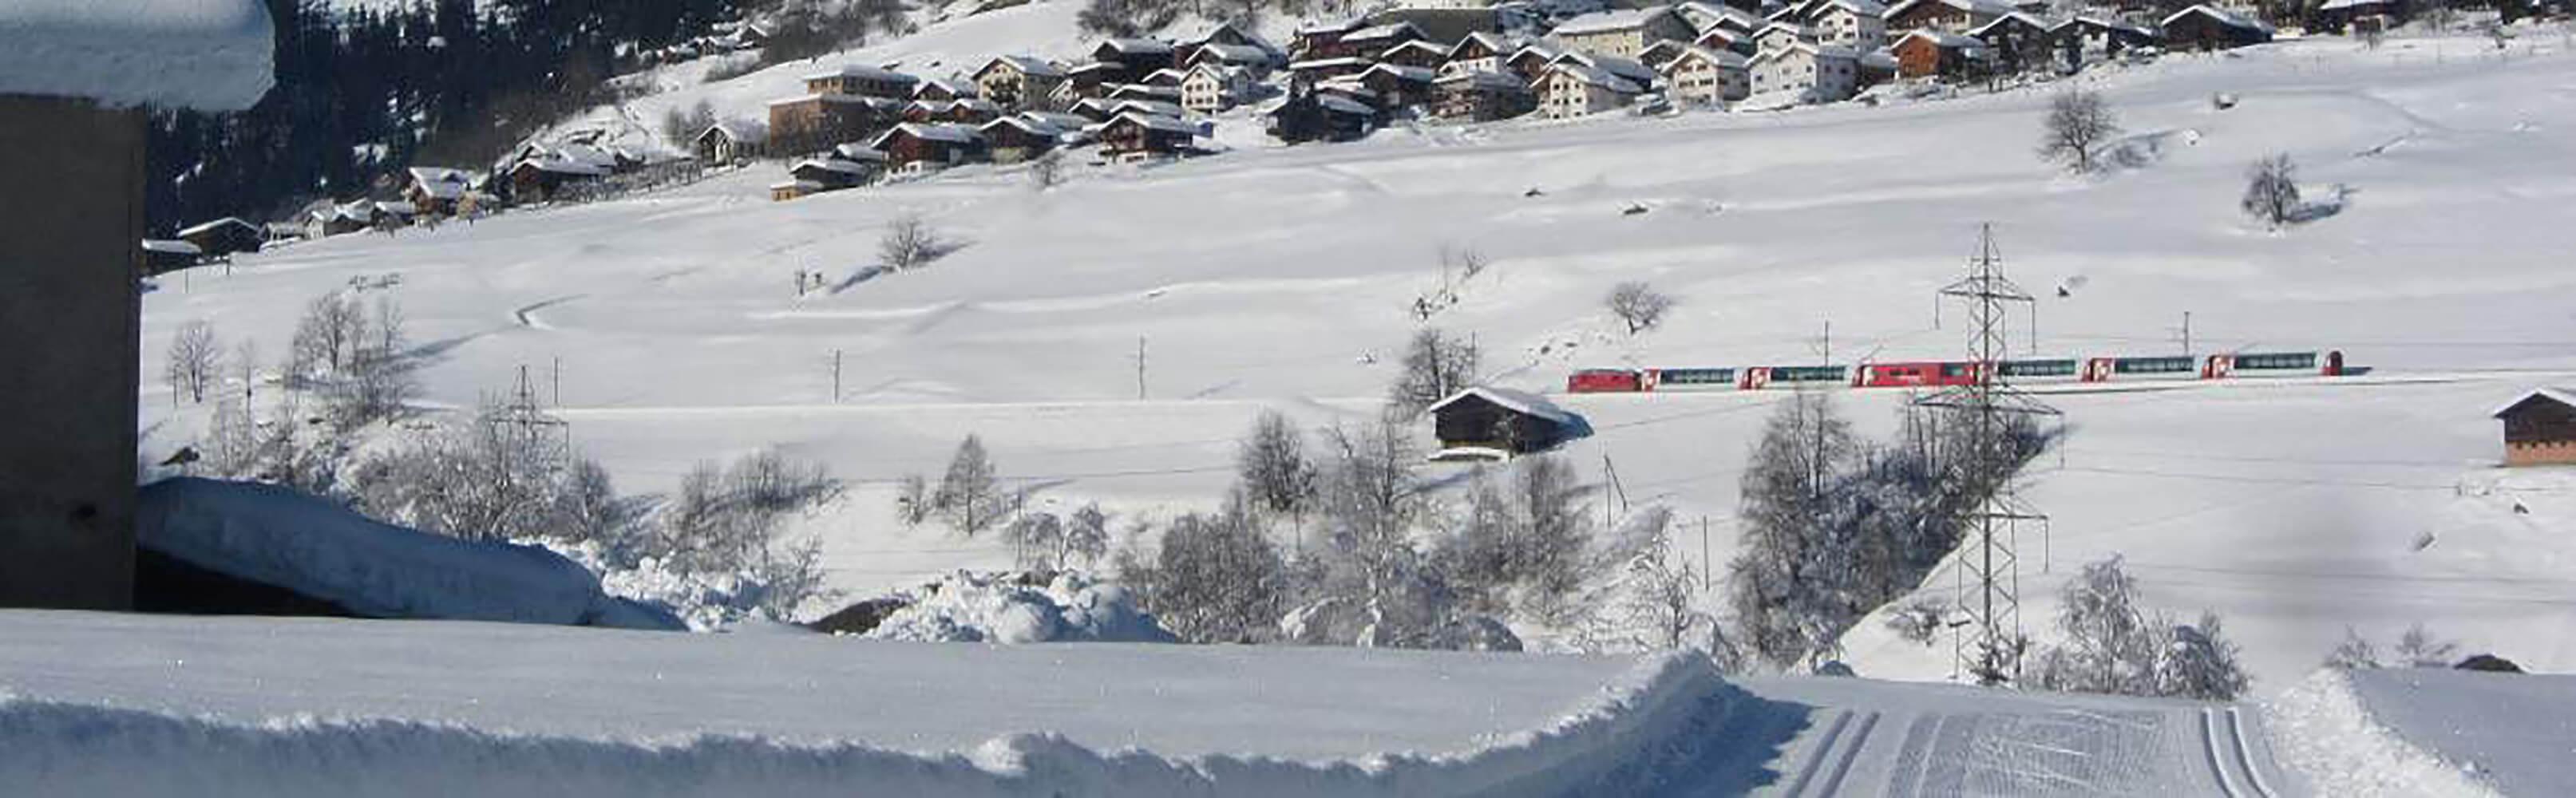 Nordic Surselva - das Langlauf-Erlebnis 1